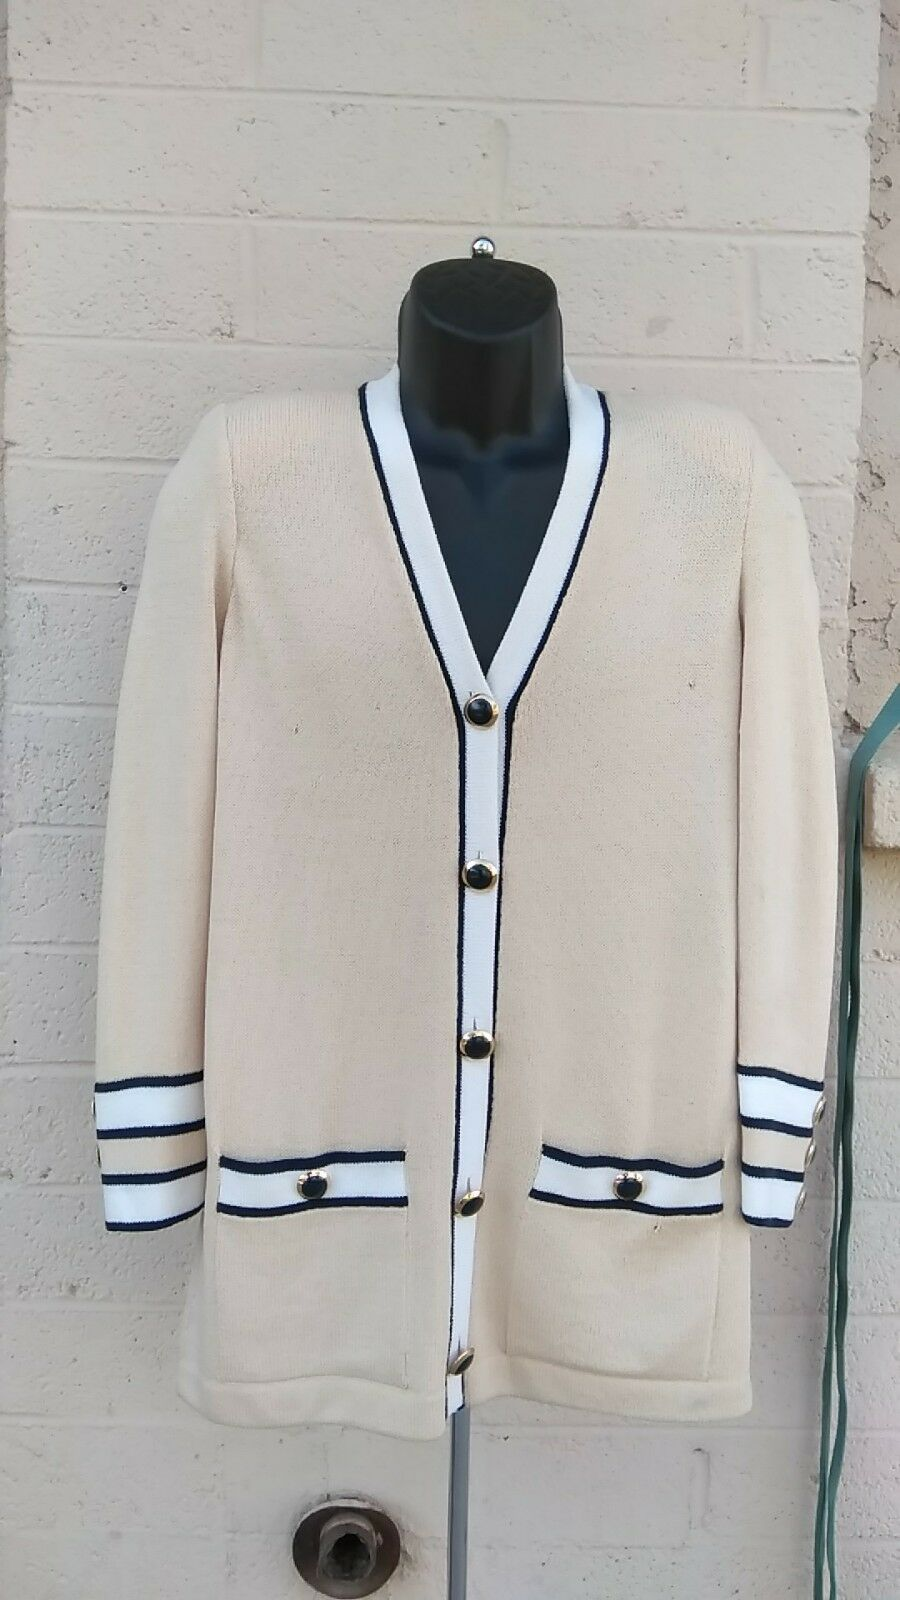 St John Santana Knit Cream Navy bluee gold Button Down Cardigan Sweater size s